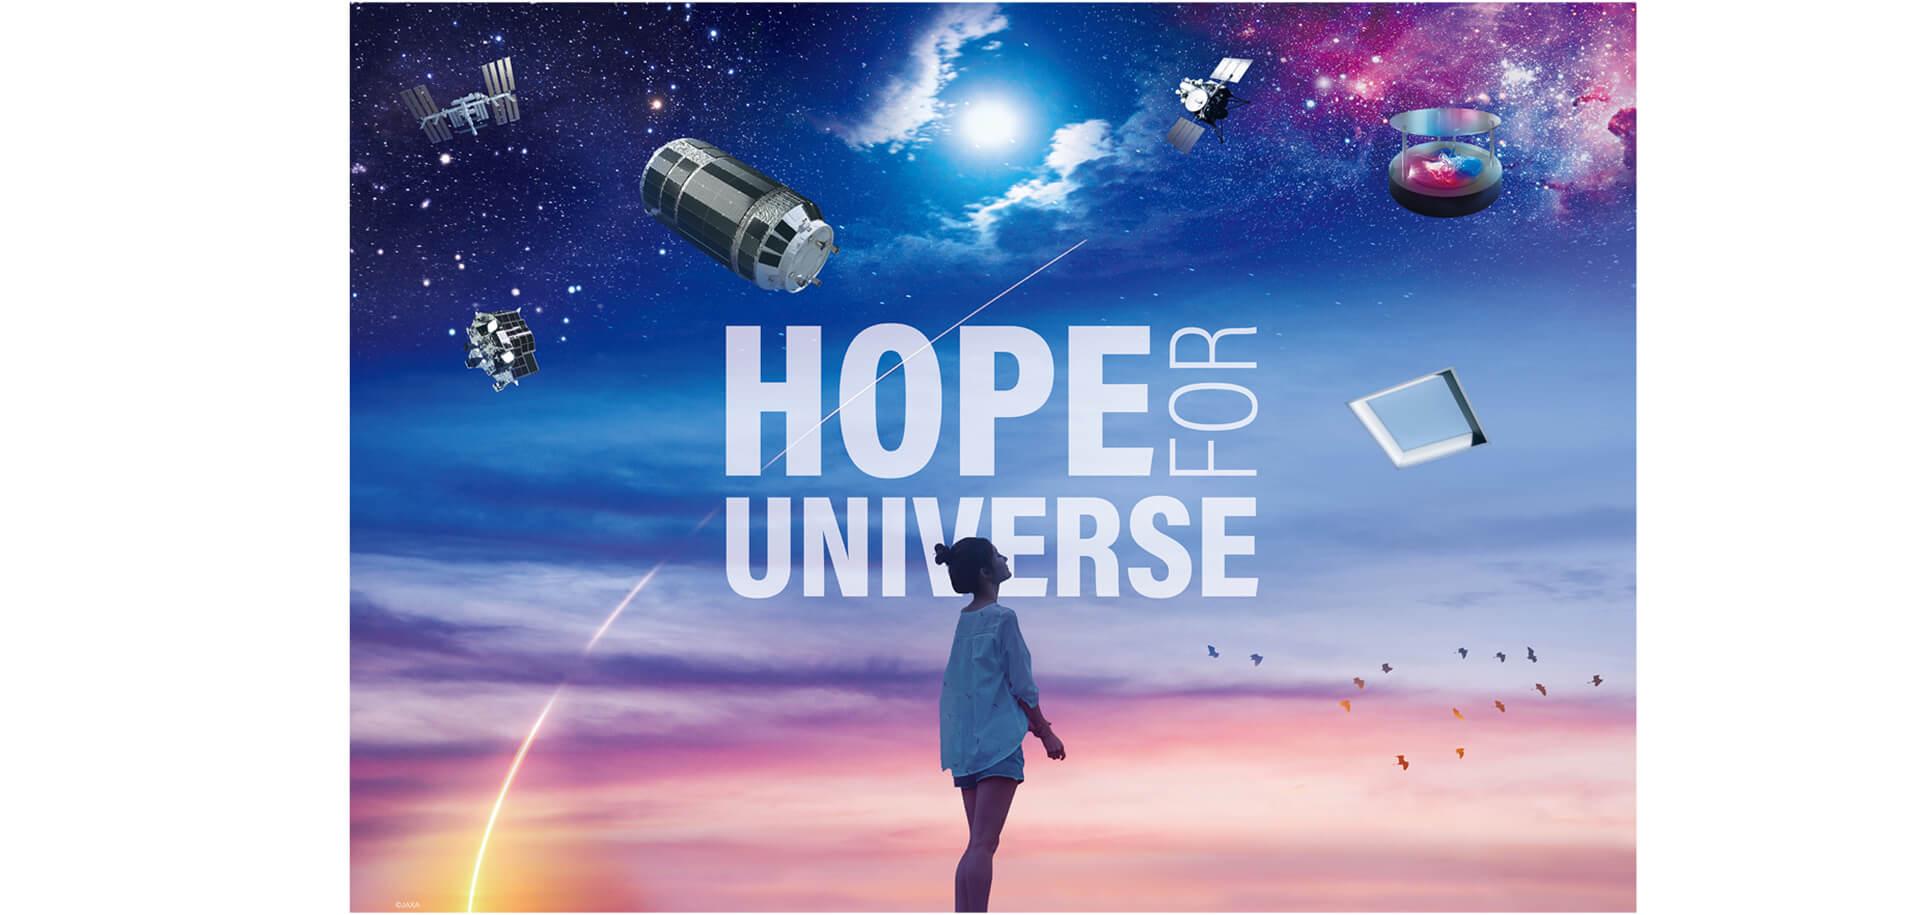 HOPE FOR UNIVERSE 人々の願いを、宙から叶える物語